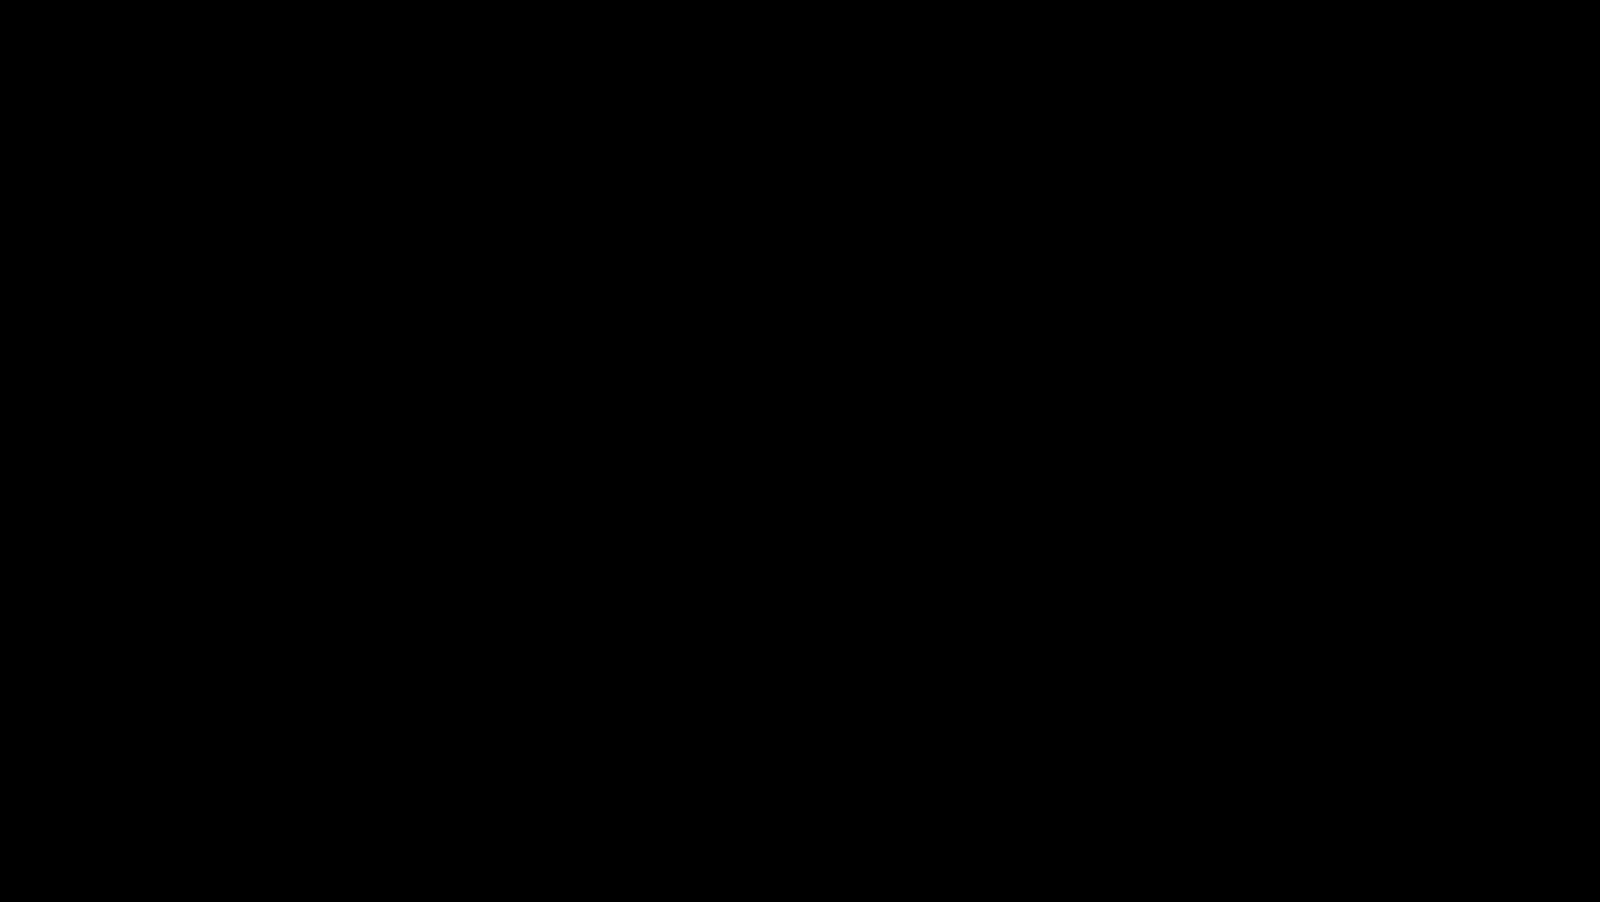 Computer icons passerine bird. Moustache clipart silhouette